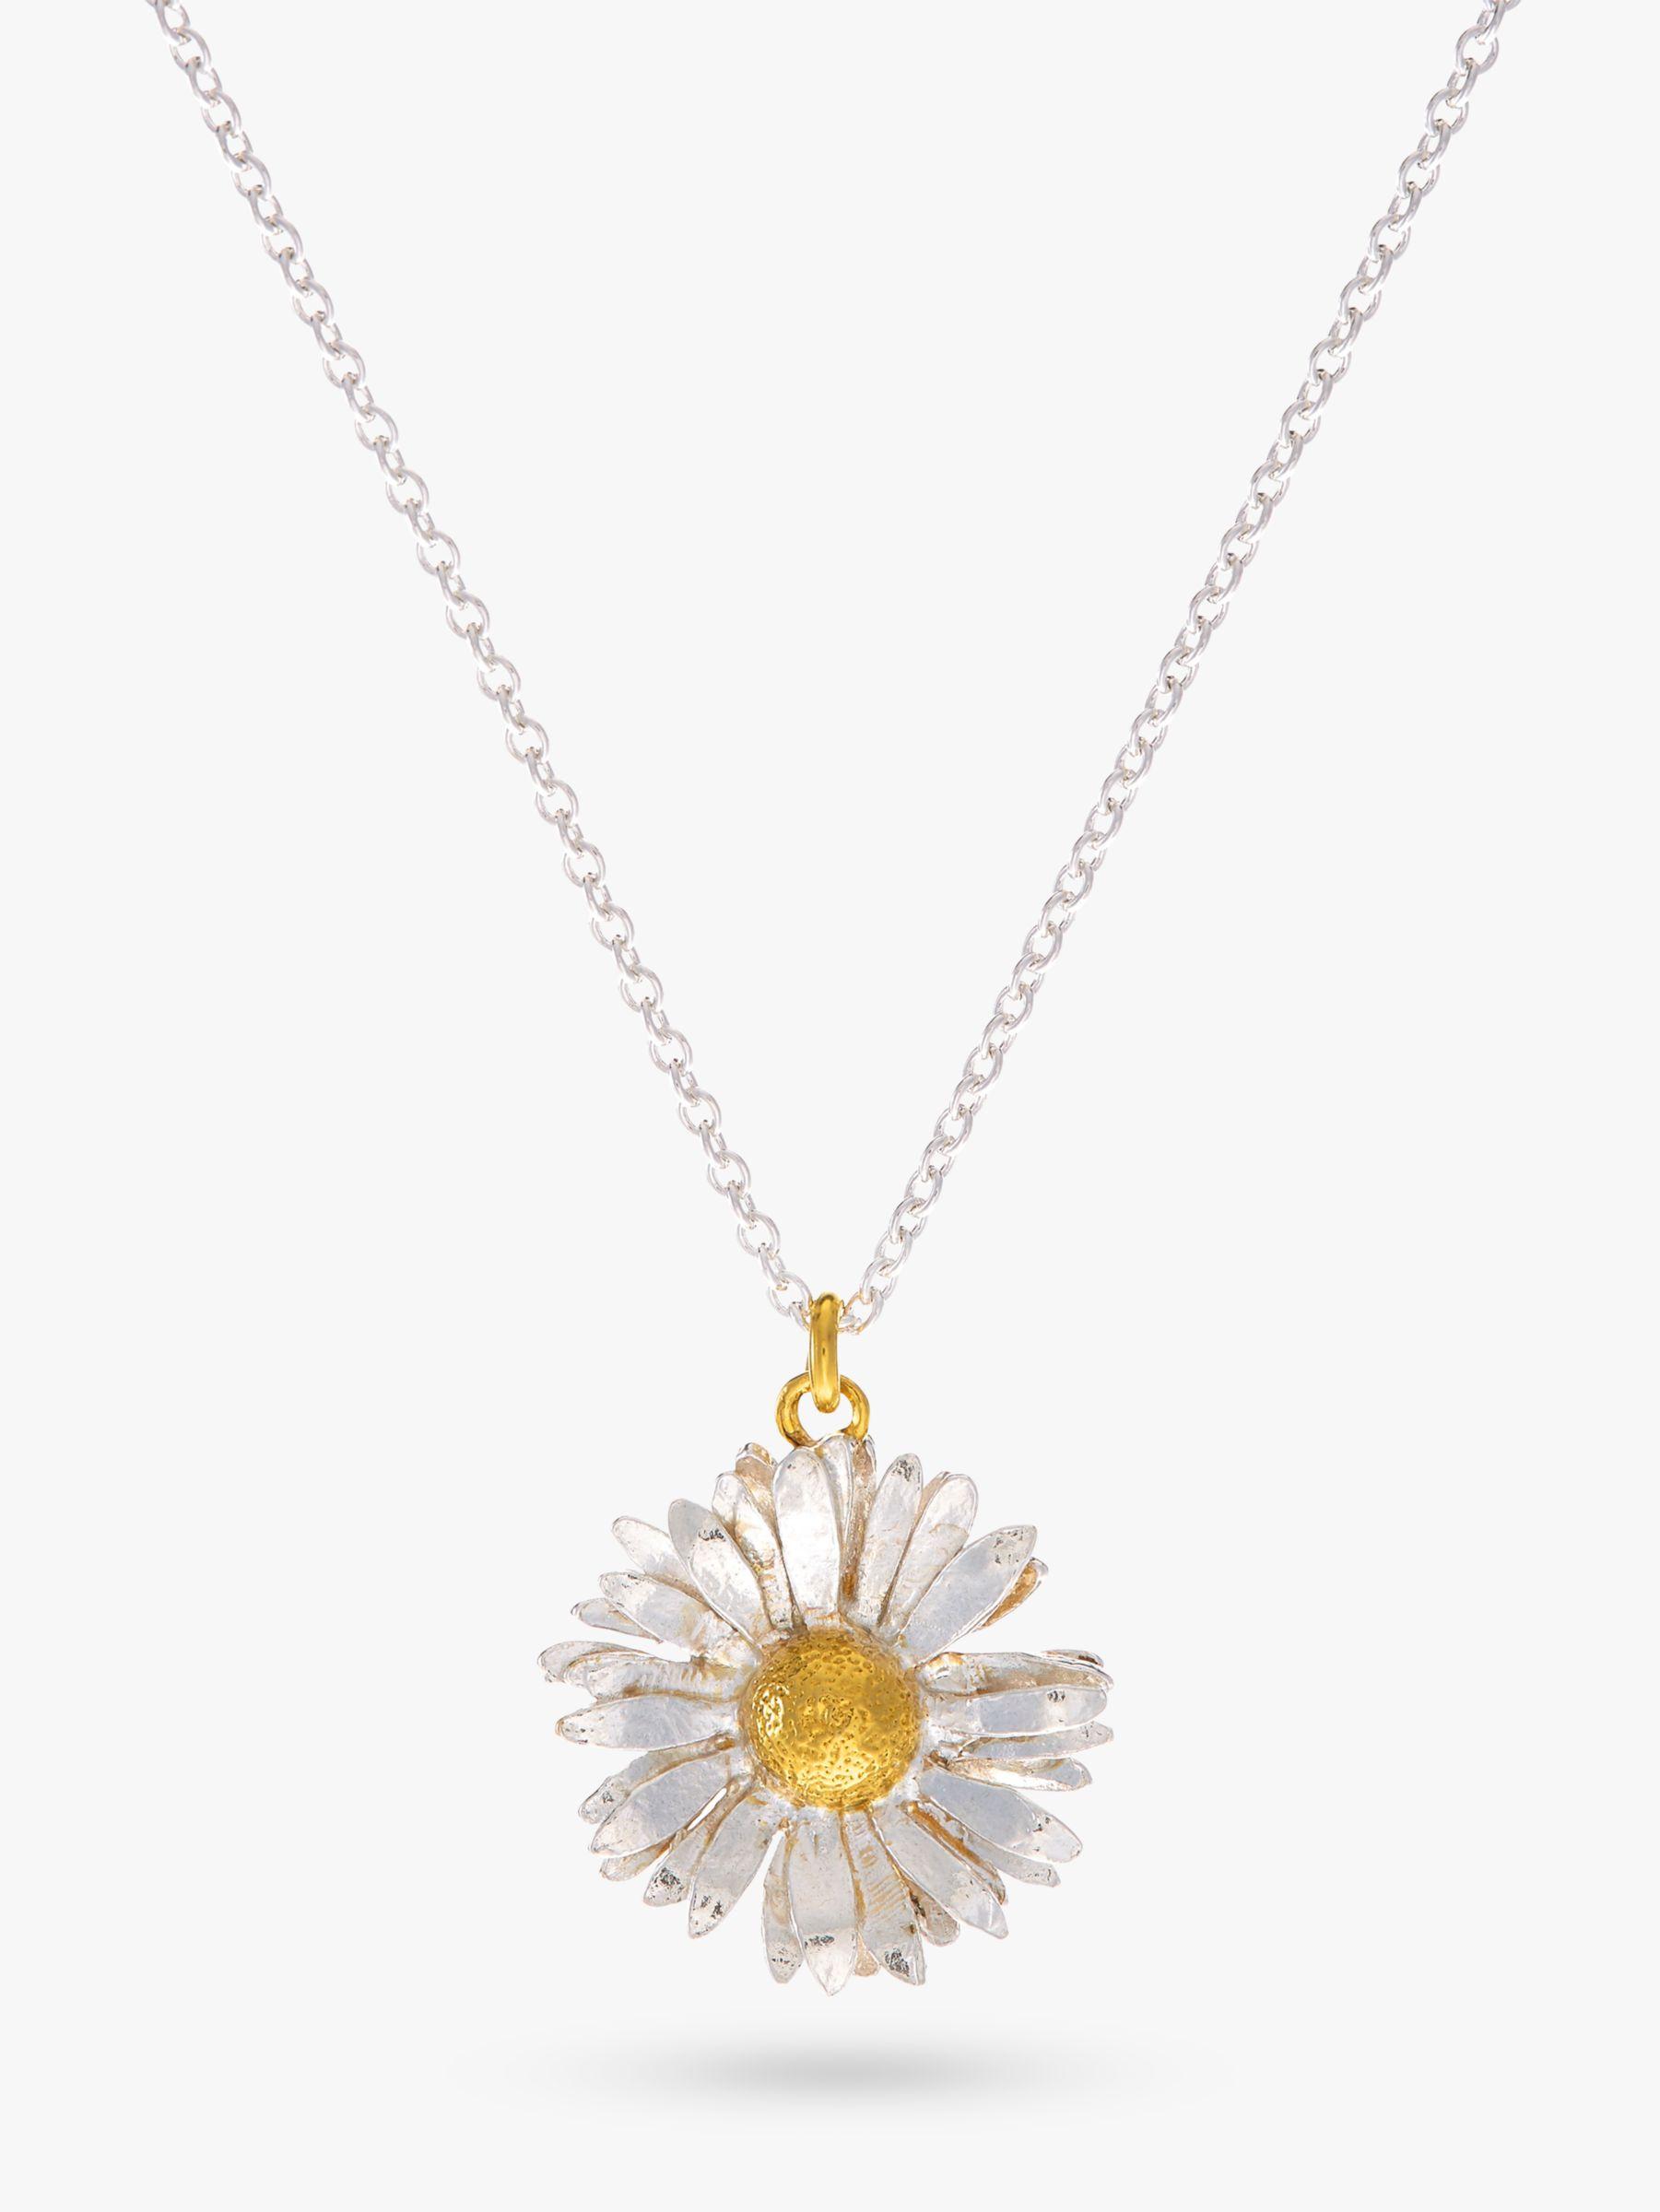 Alex Monroe Alex Monroe for John Lewis Daisy Pendant Necklace, Silver/Gold